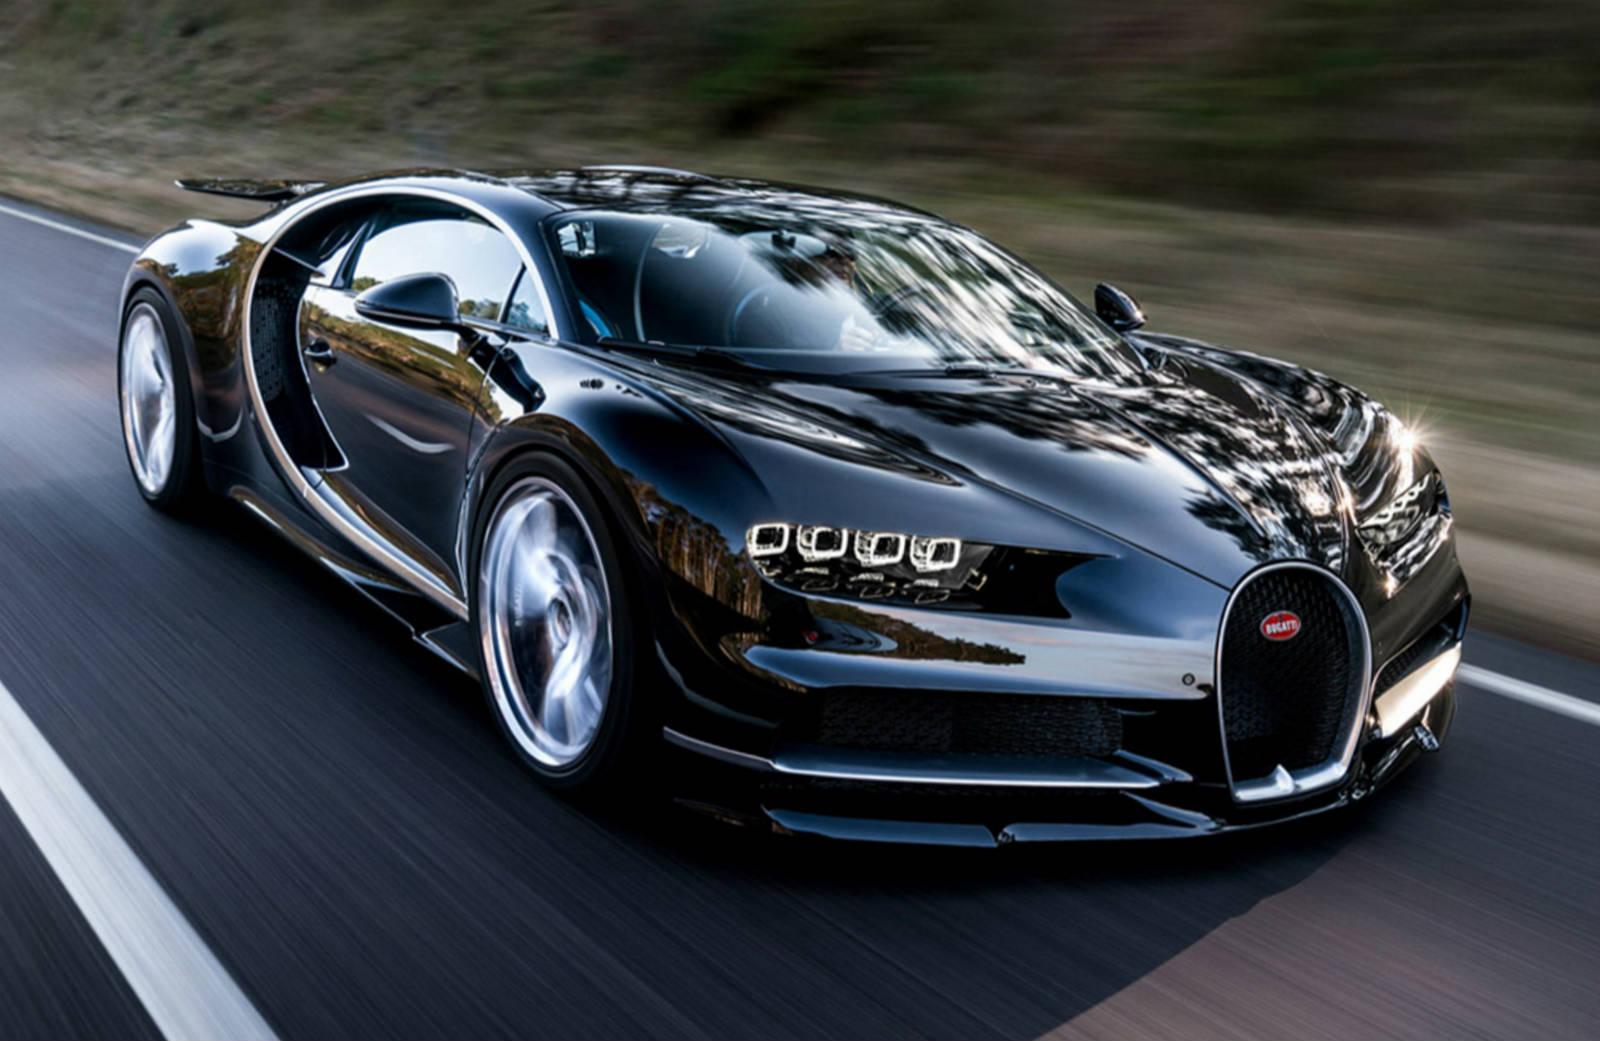 2013 Bugatti Veyron Engine Diagram 3 5 Mm Socket Wiring Diagram Begeboy Wiring Diagram Source